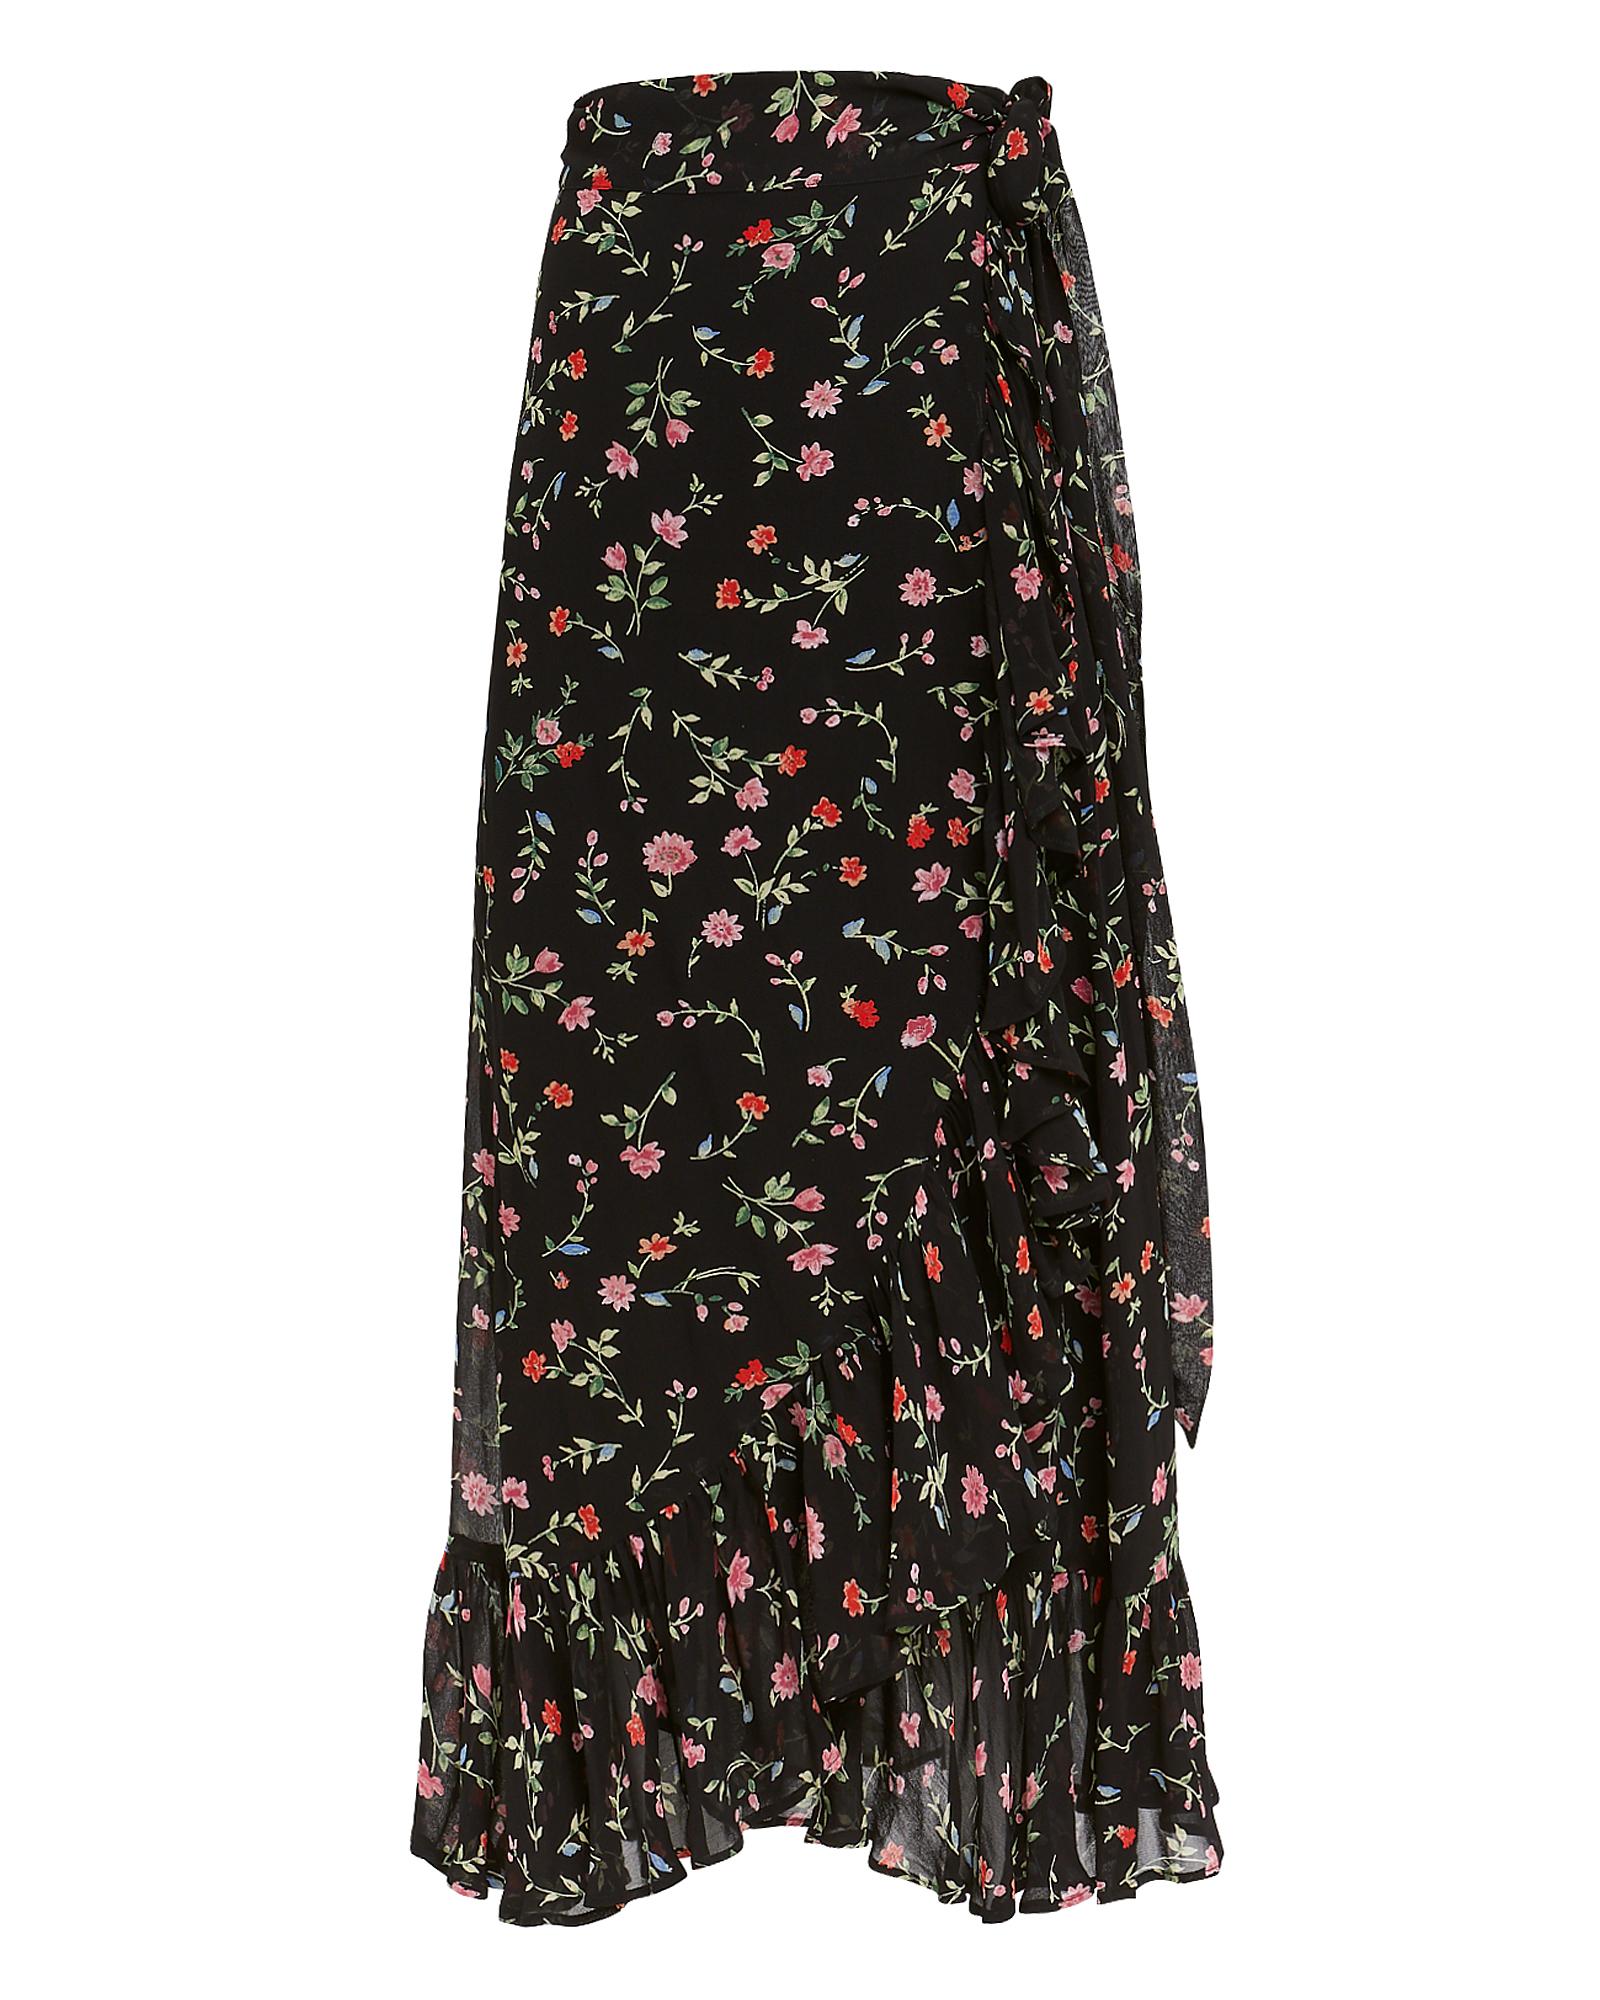 Ganni Skirts GANNI PRINTED GEORGETTE BLACK FLORAL WRAP SKIRT  BLACK 34